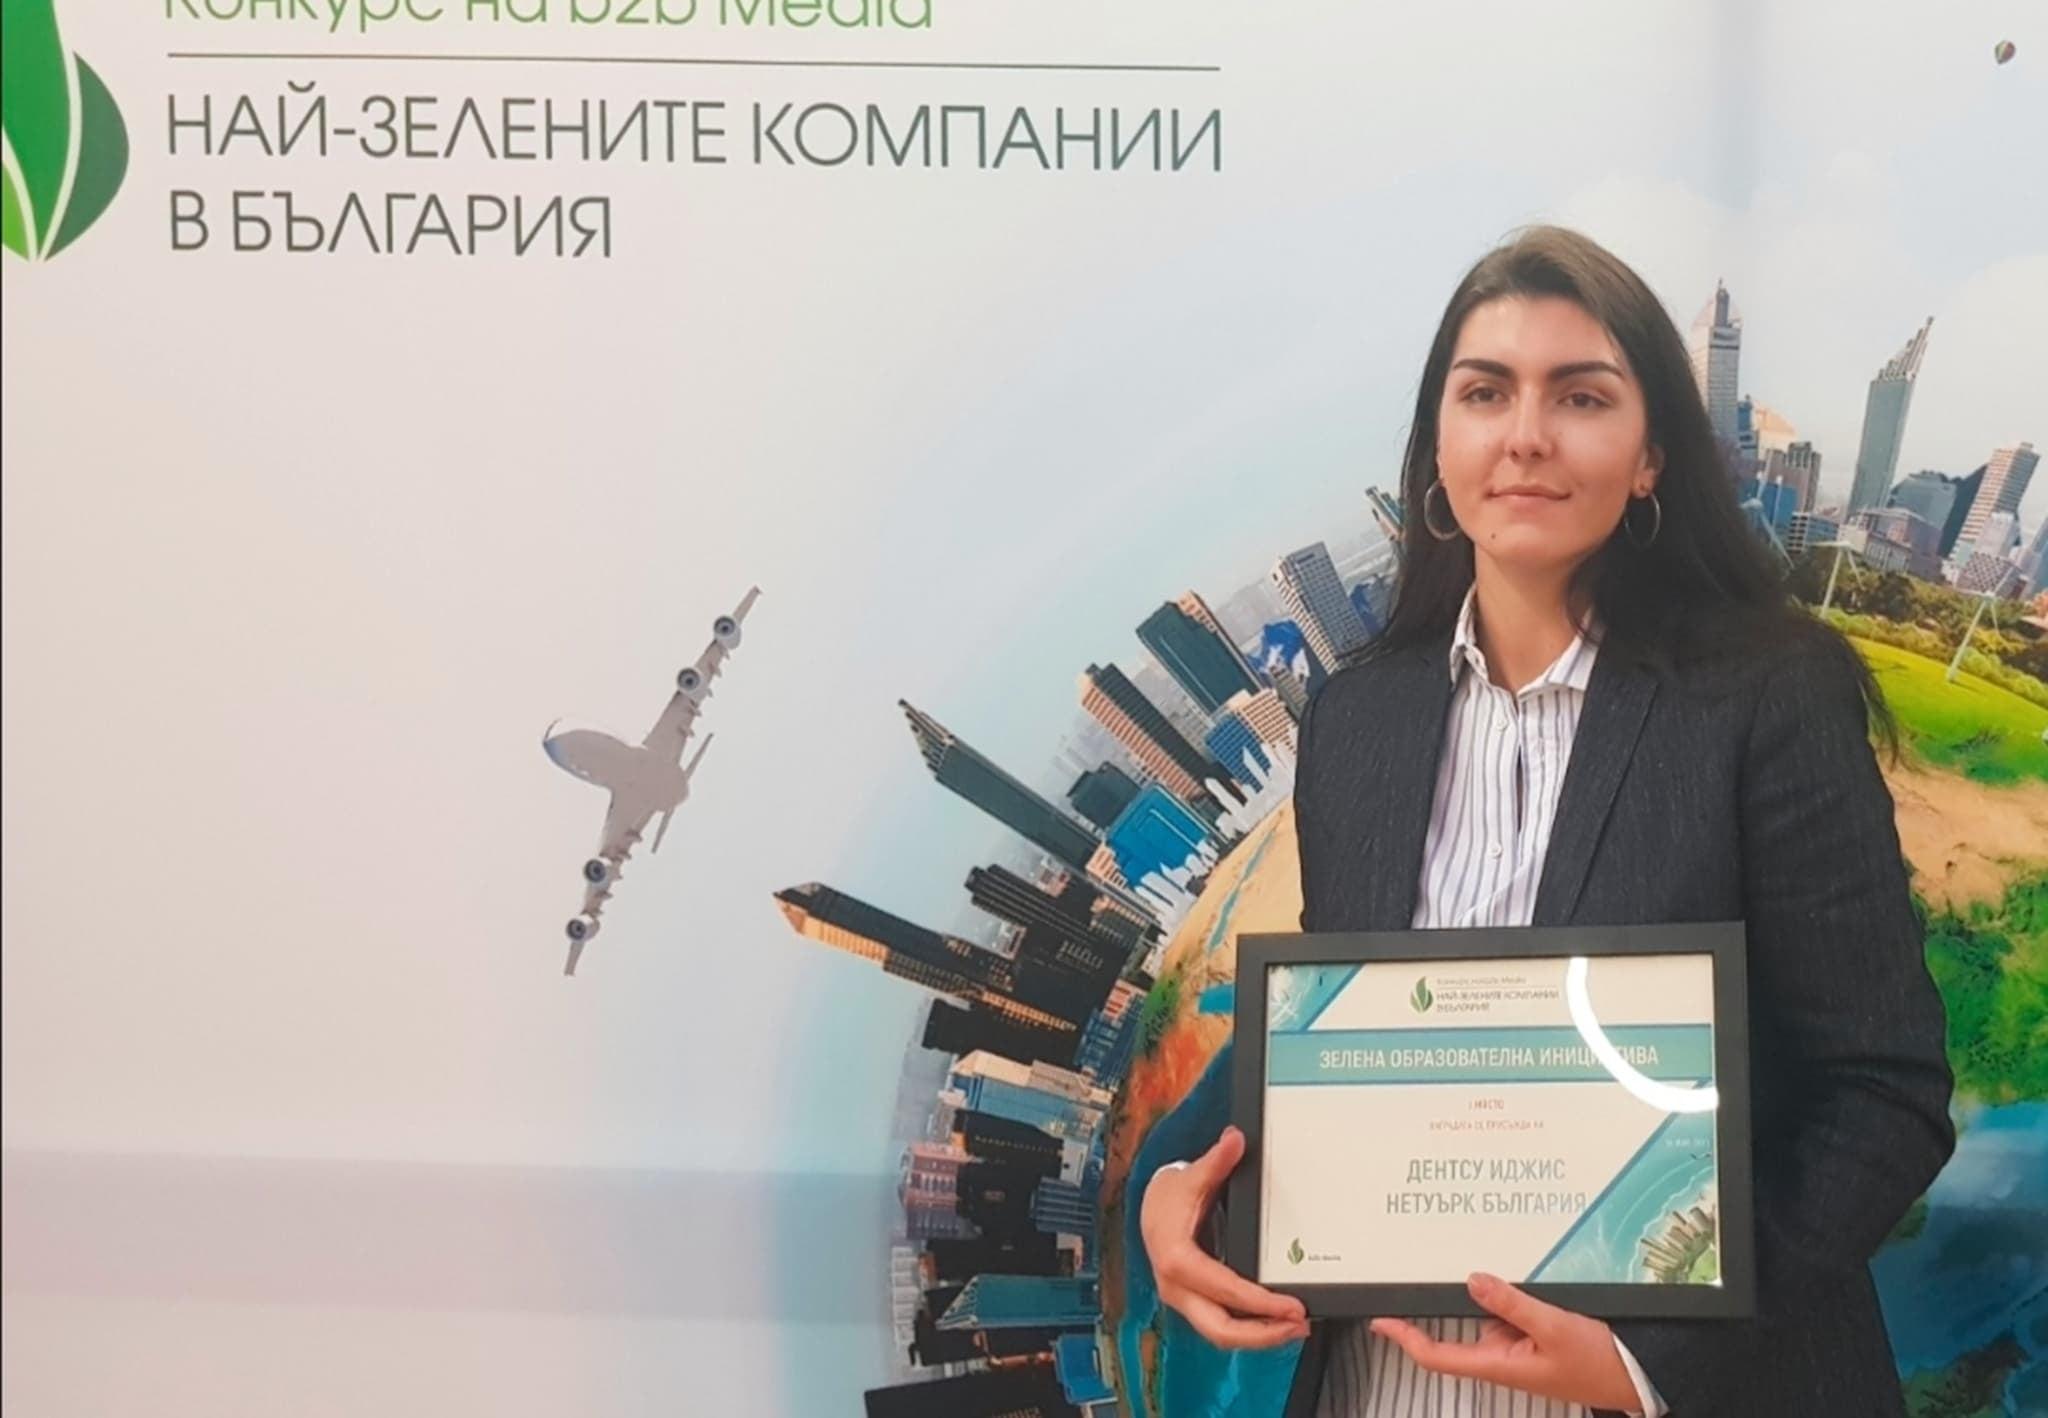 Ivana Popova from dentsu Bulgaria receiving the B2B Media Award for the Best Educational Campaign